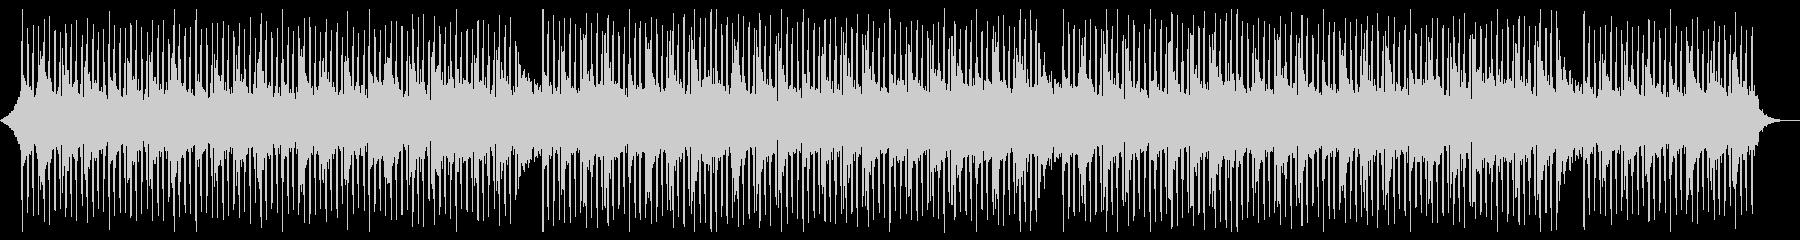 Clear Impressionの未再生の波形